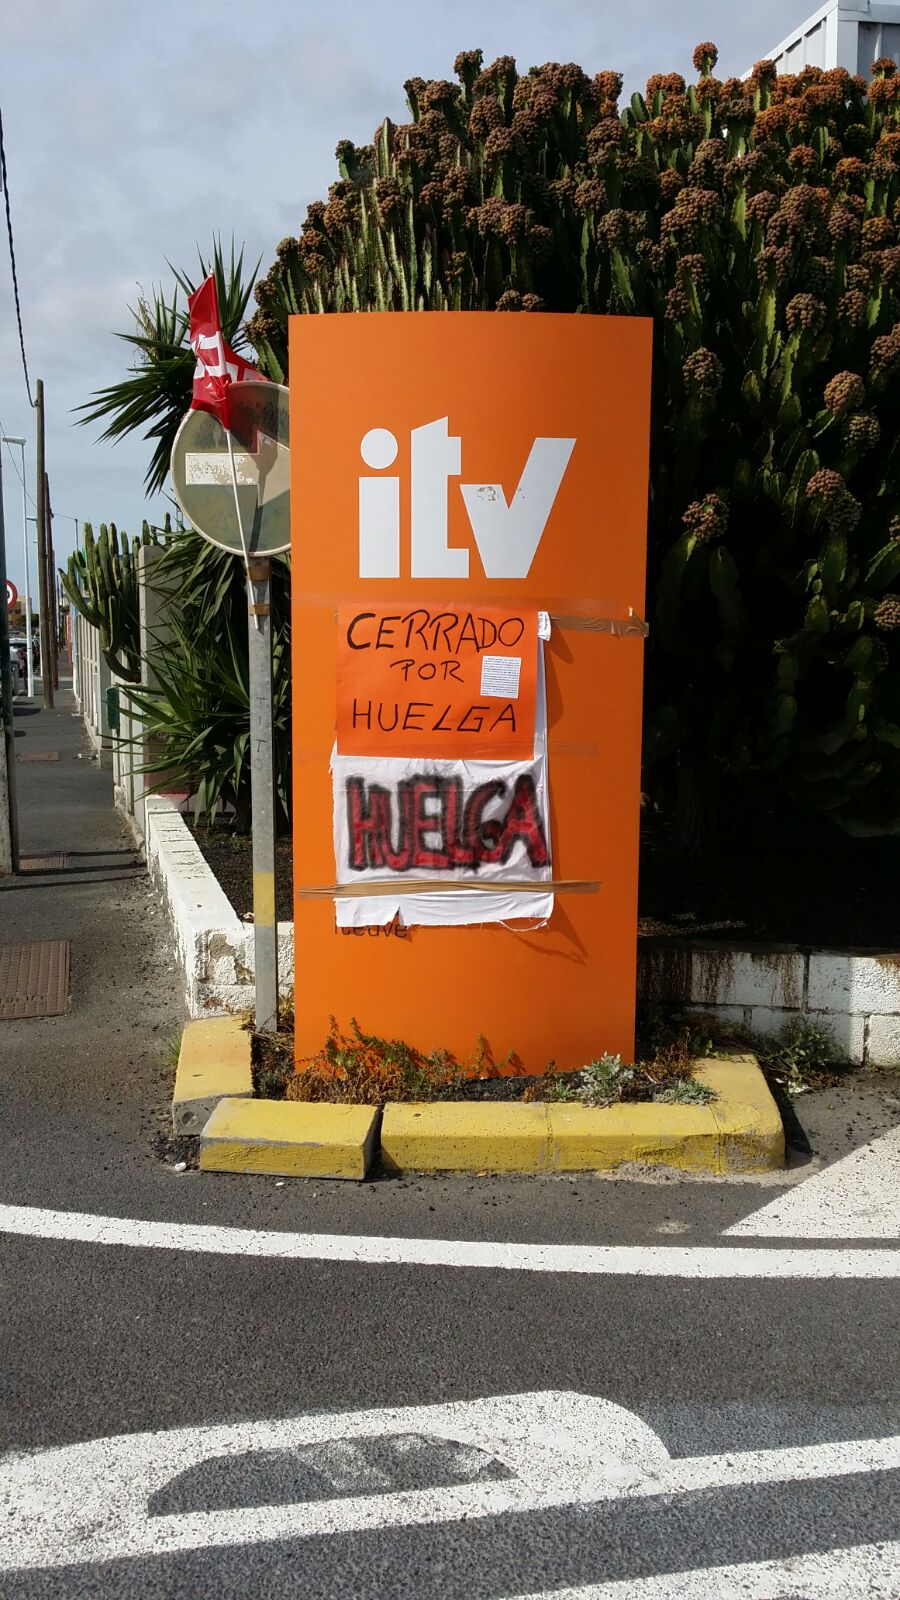 Huelga ITV